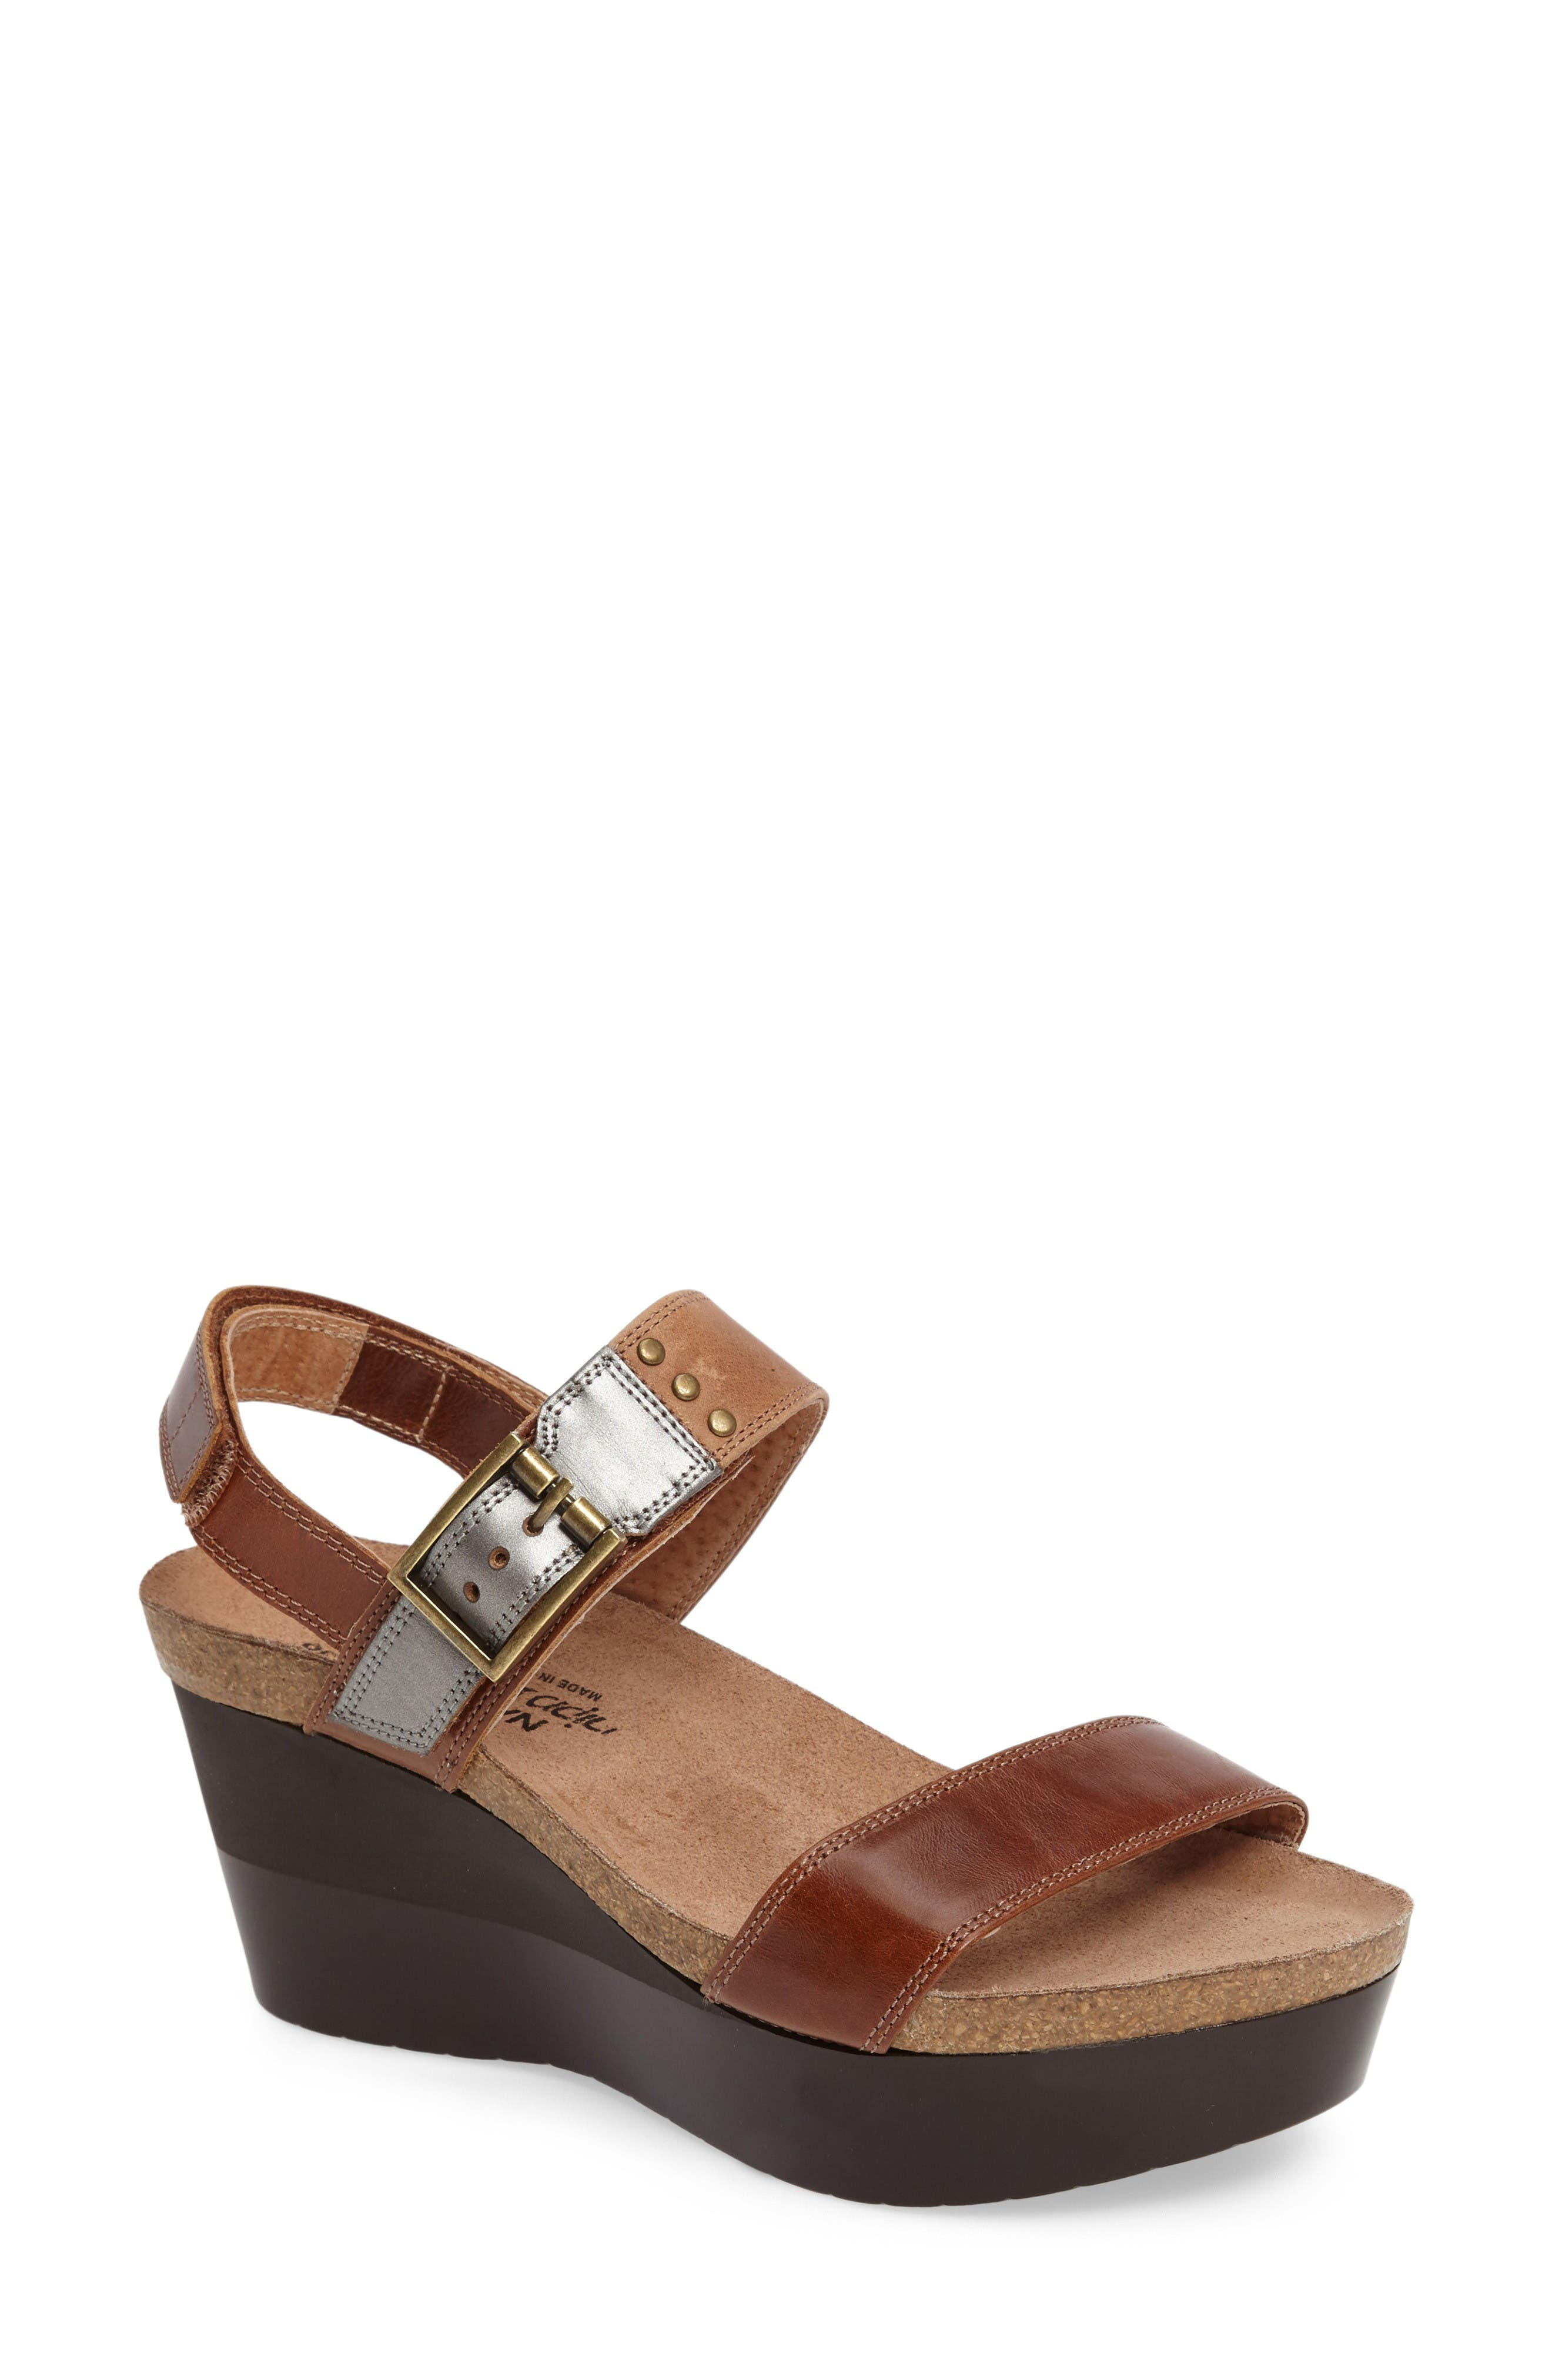 Main Image - Naot Alpha Platform Wedge Sandal Sandal (Women)